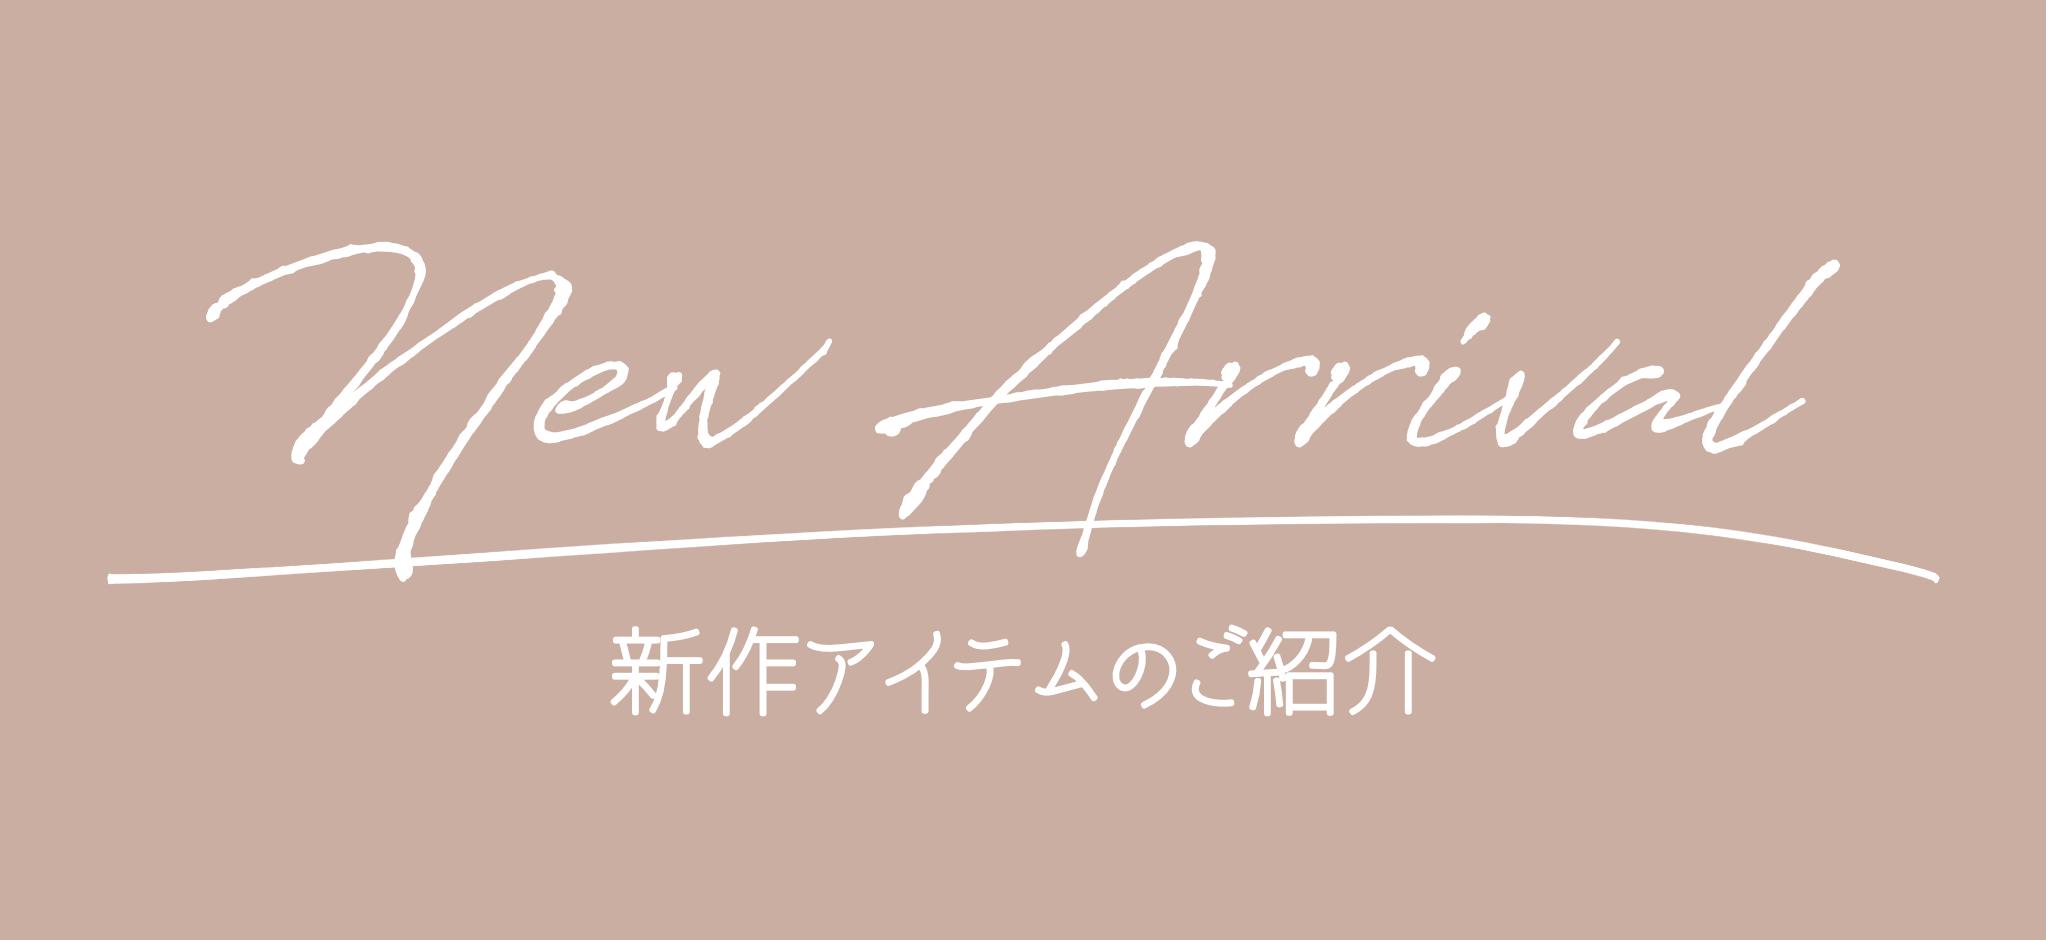 【New Arrival】大注目の新作アイテムをご紹介!